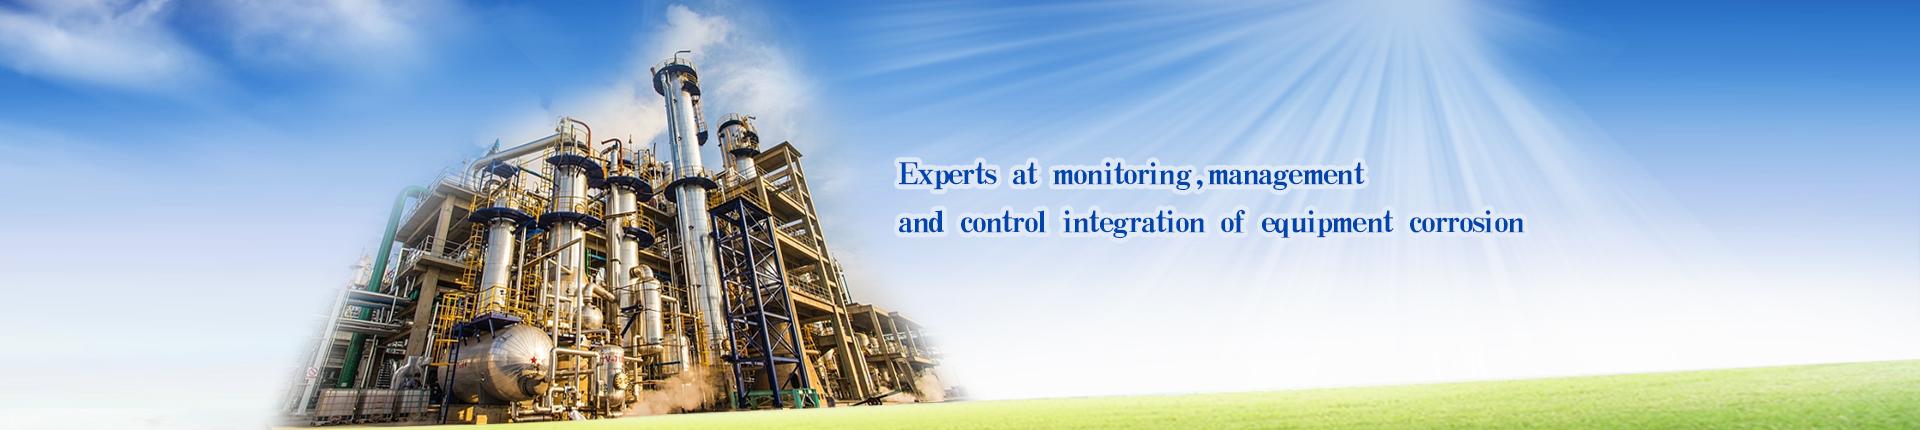 The corrosion monitoring probe